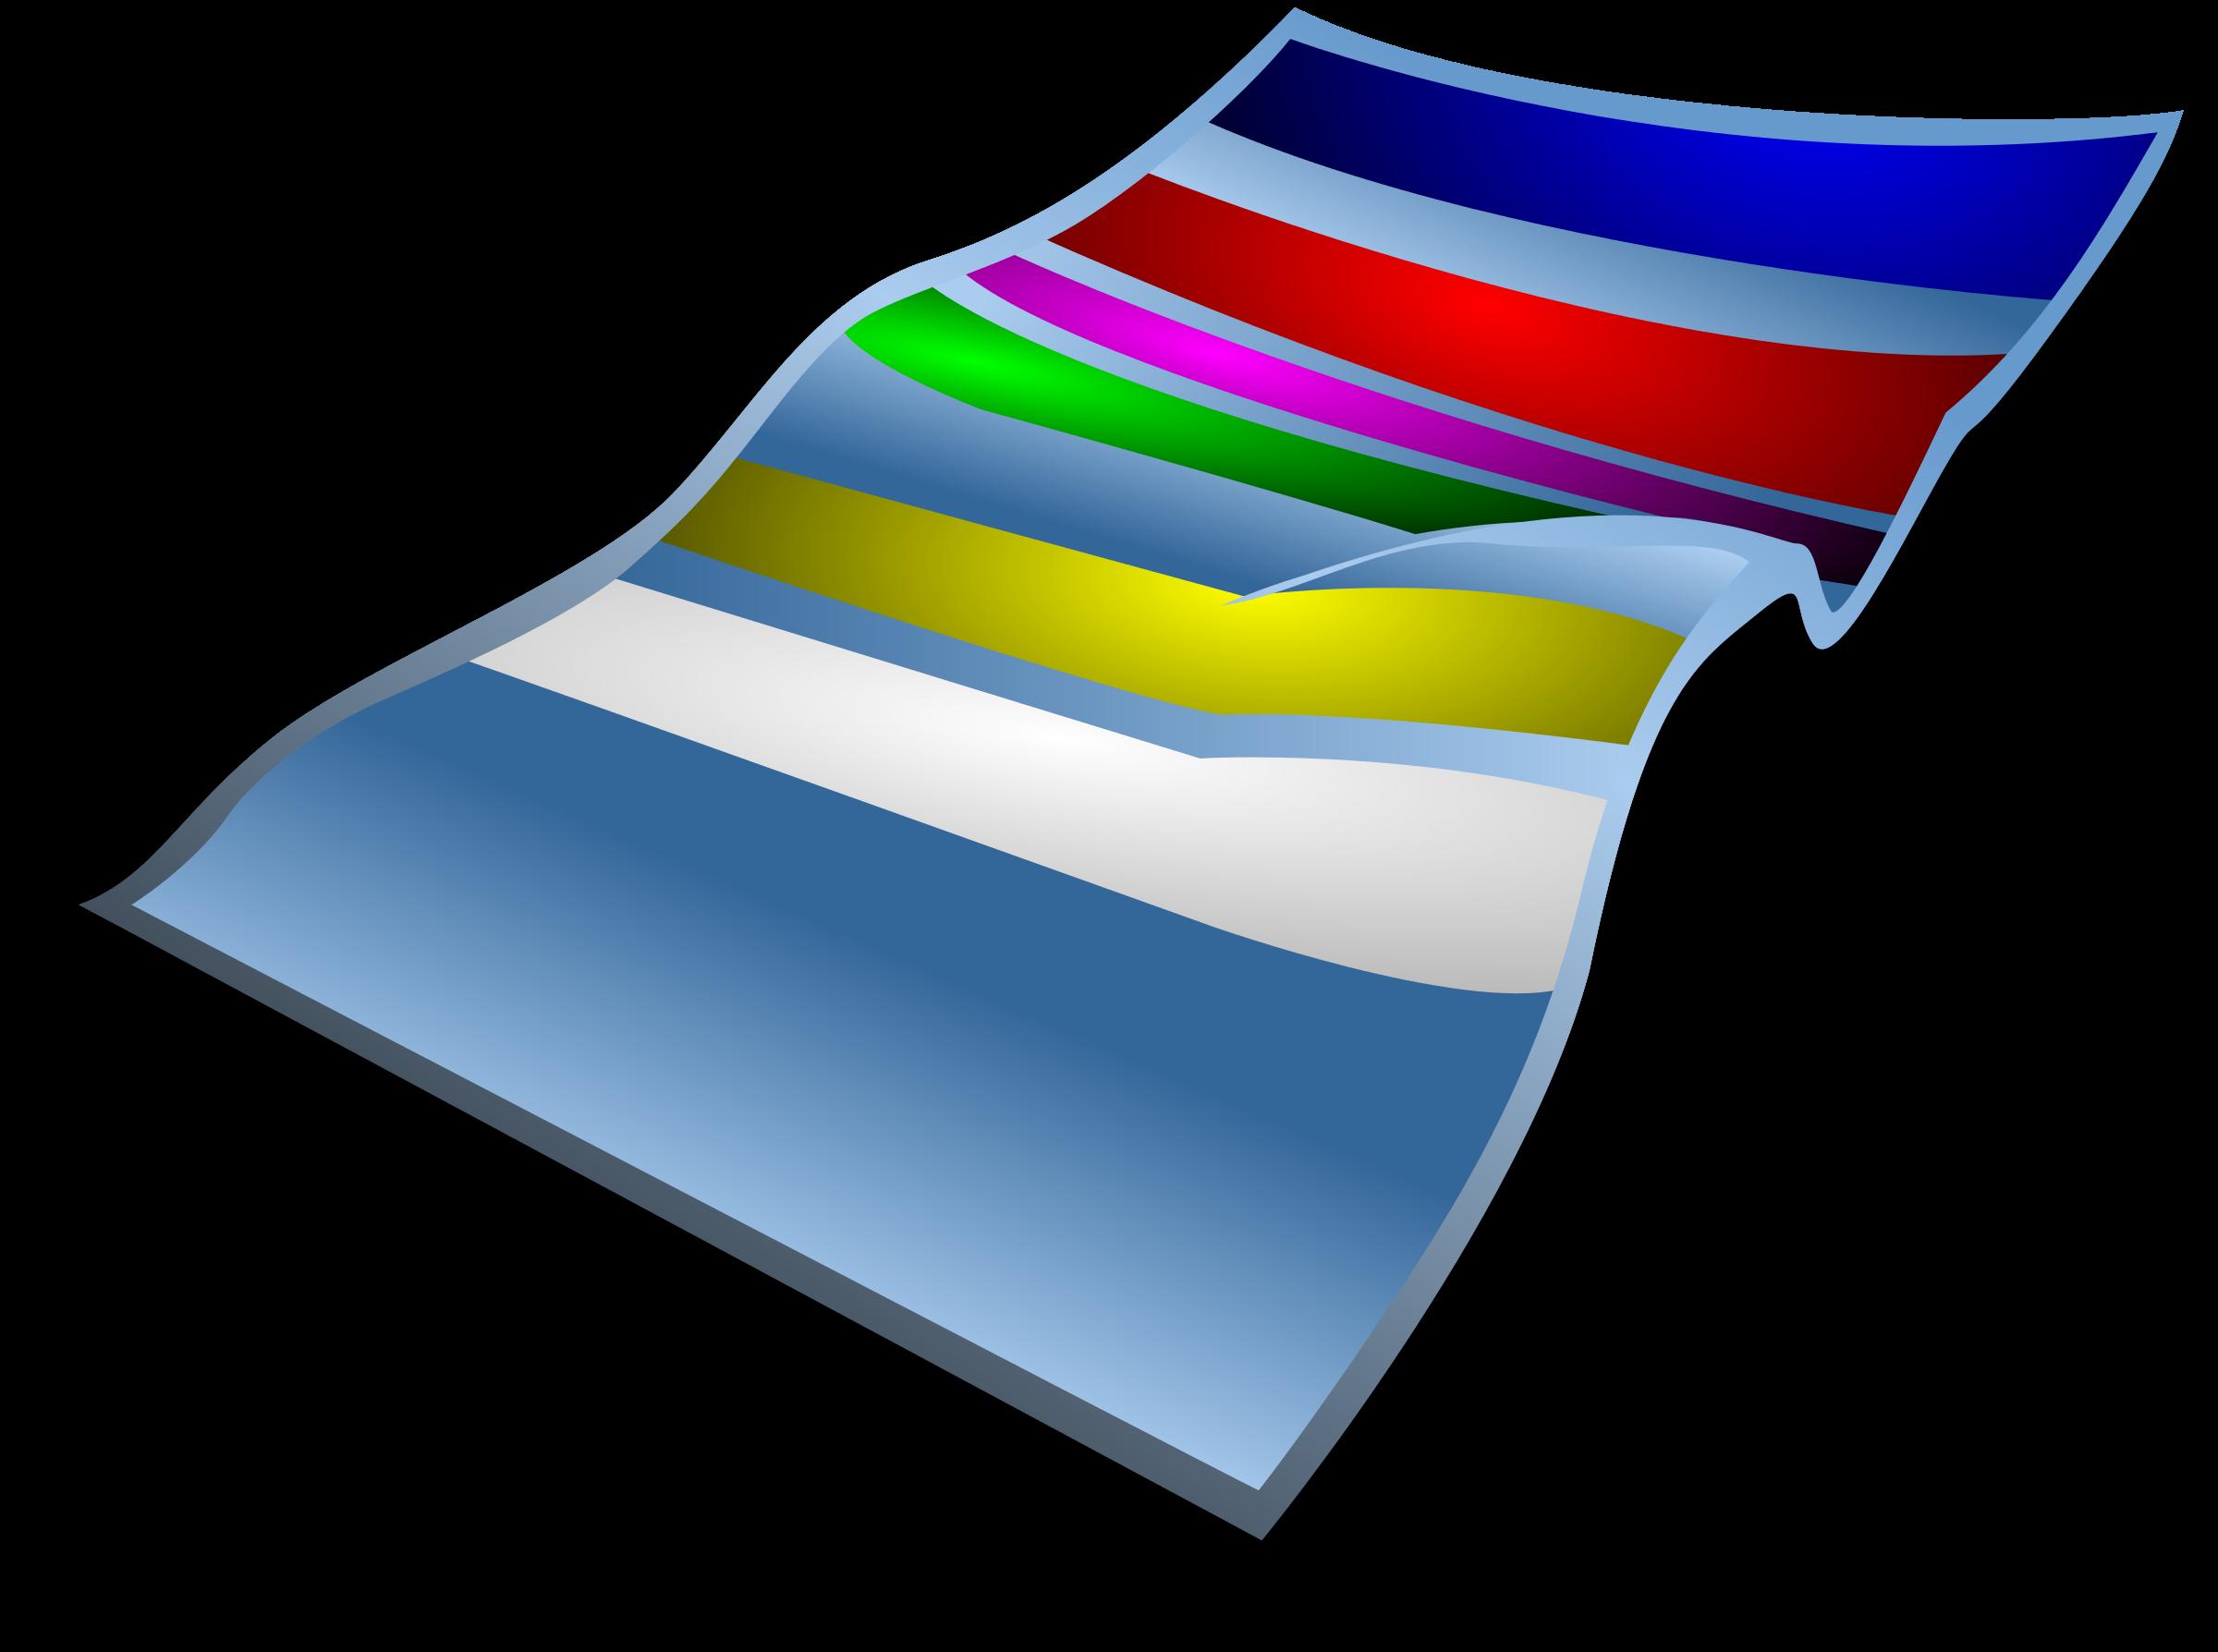 Images For Clipart Towel-Images For Clipart Towel-13